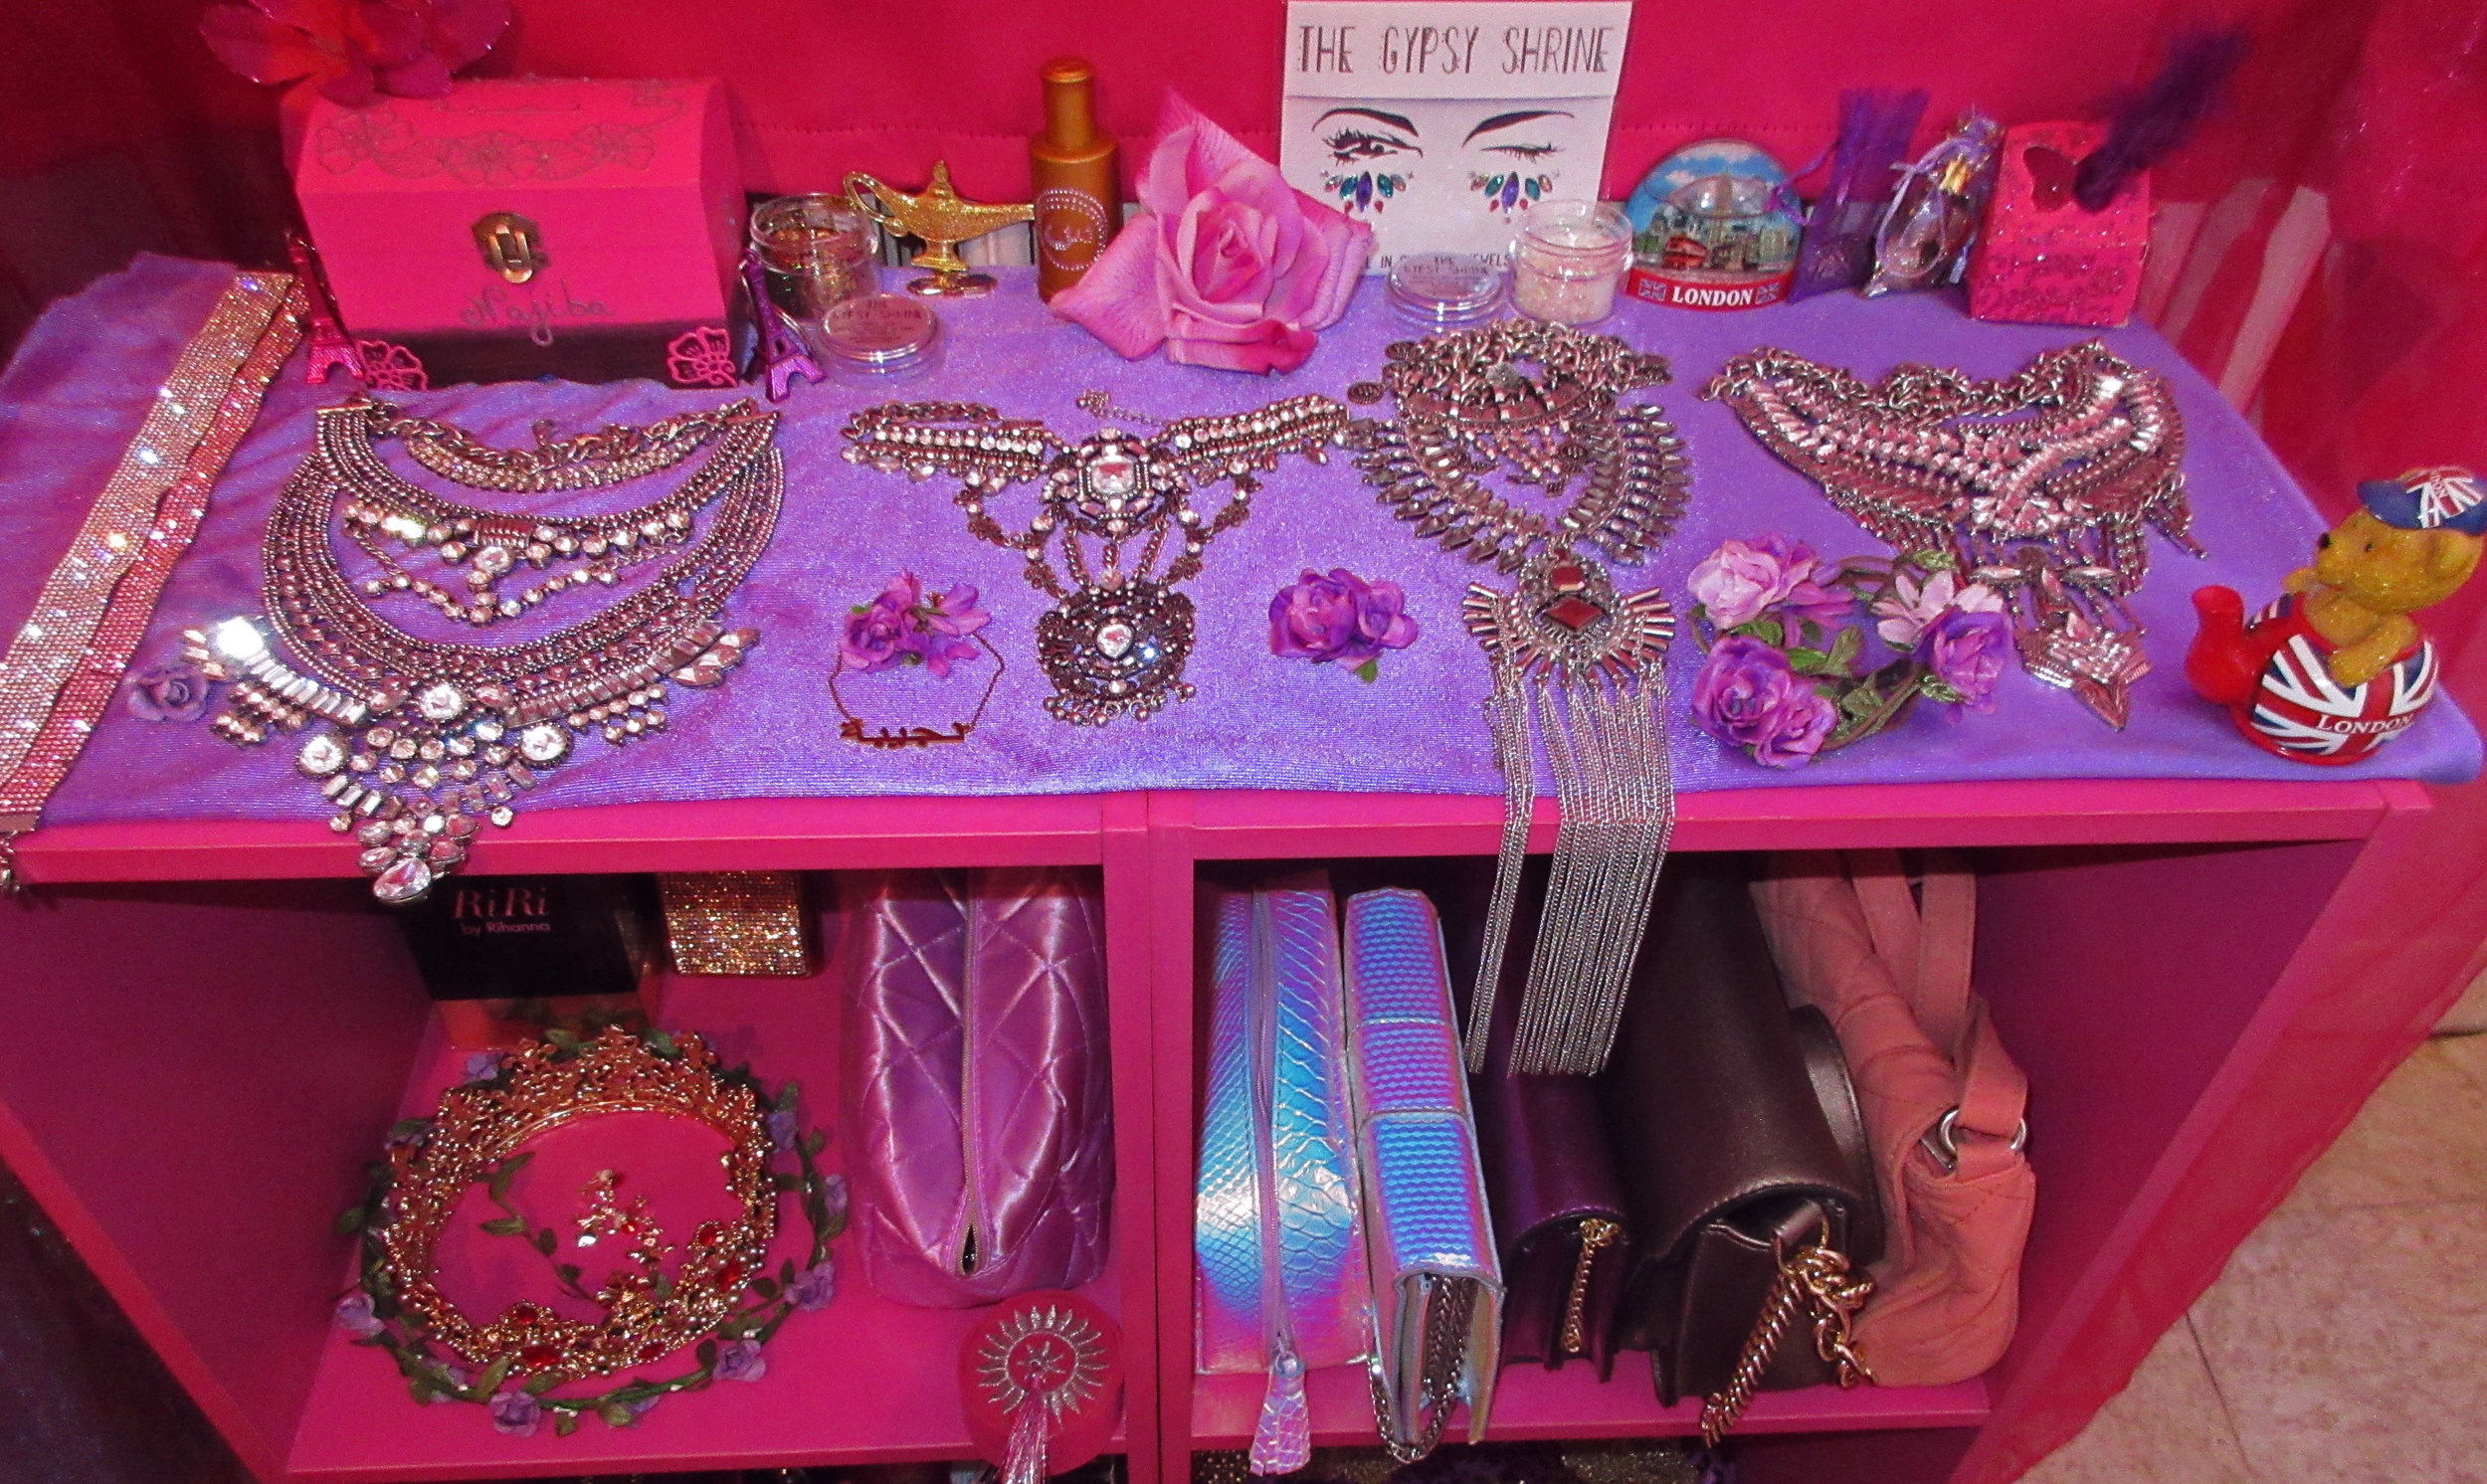 Jewels - Necklaces - Accessories